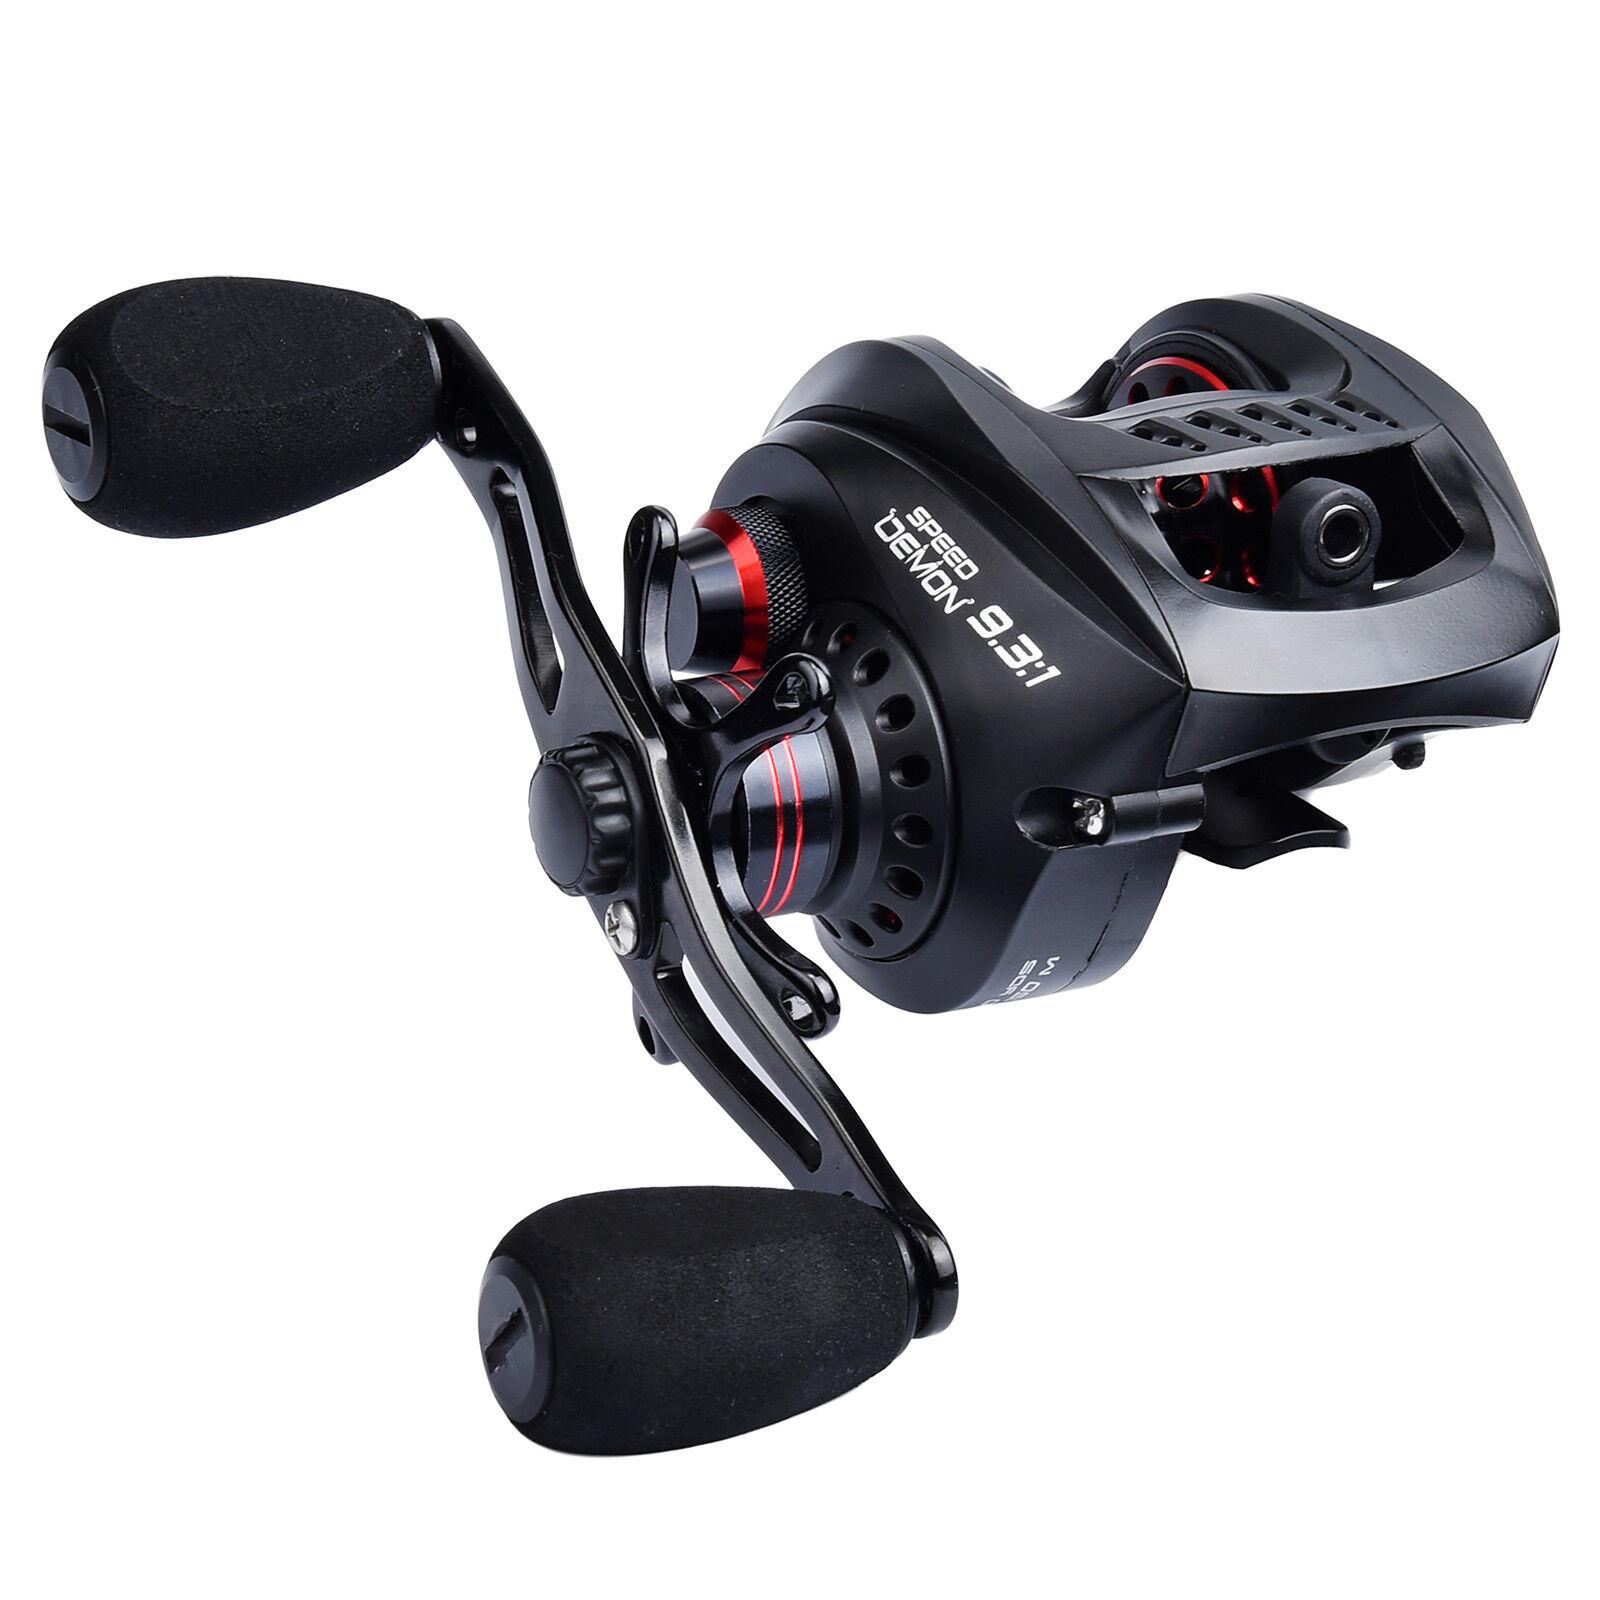 KastKing Speed Demon Baitcasting Reels 9.3 1 Gear Ratio Right Hand Fishing Reel